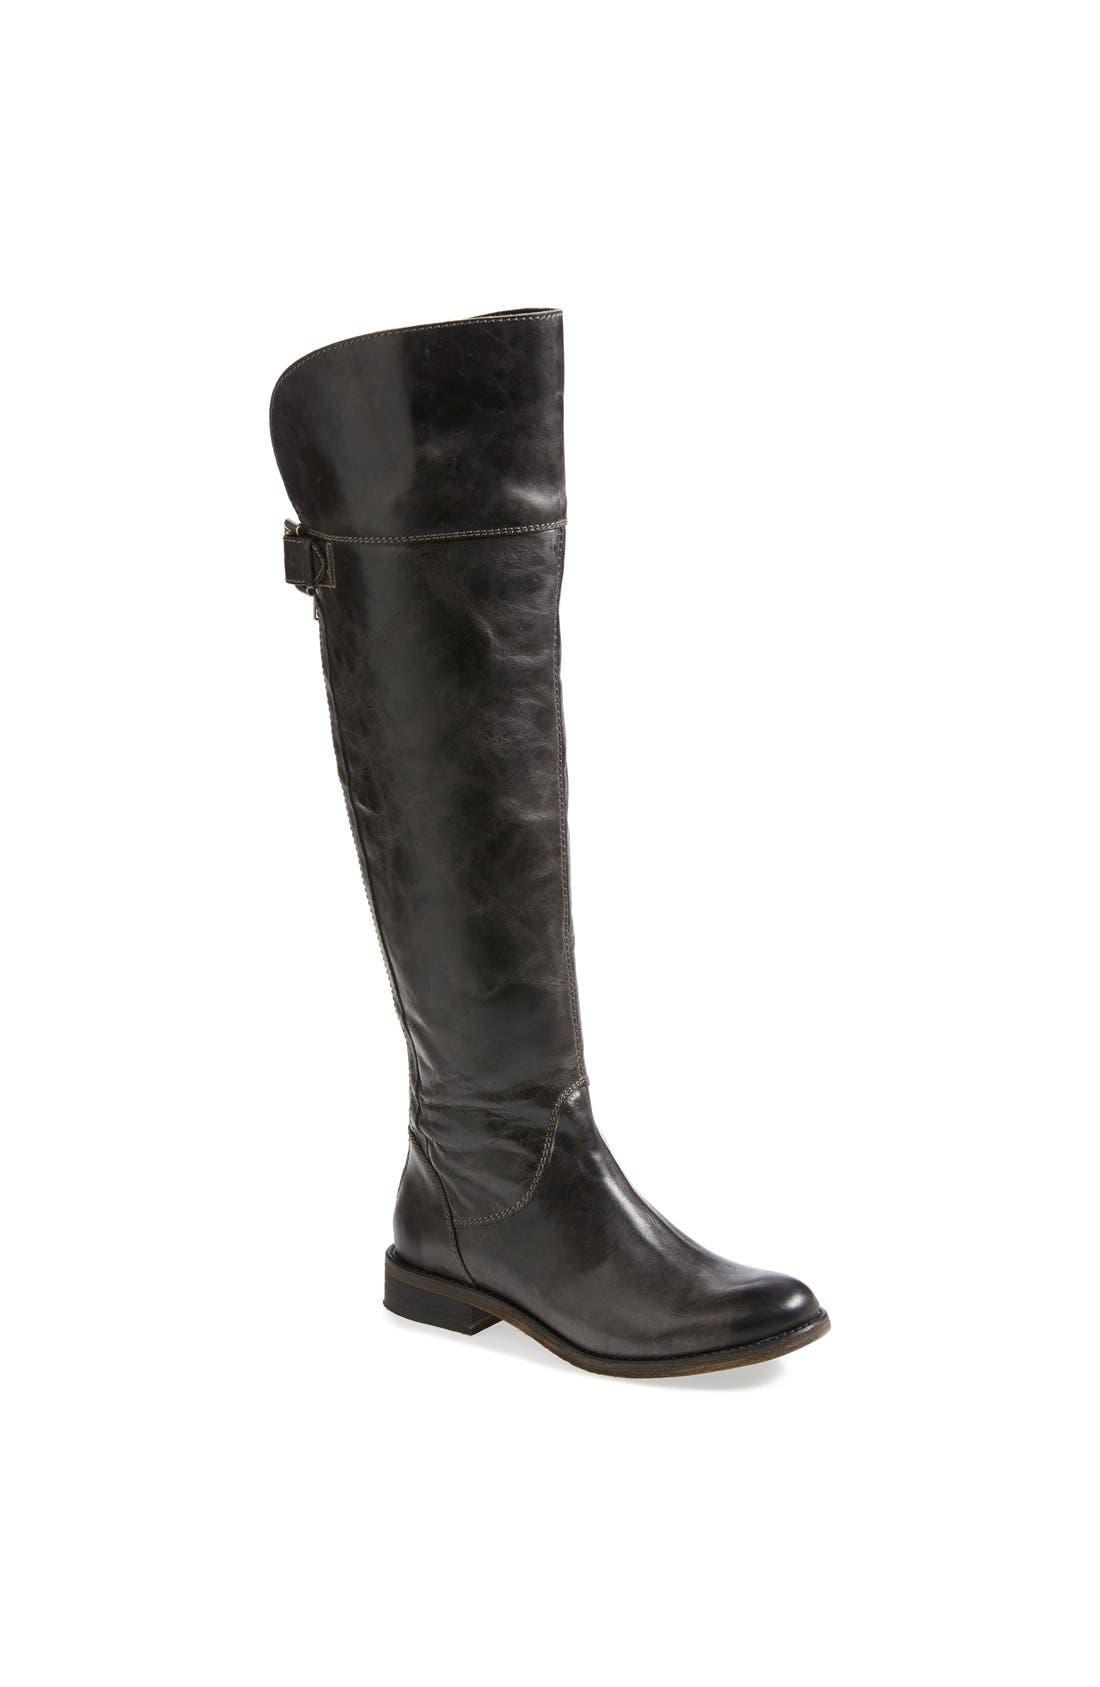 Main Image - Hinge 'Sannibel' Leather Over the Knee Boot (Women)